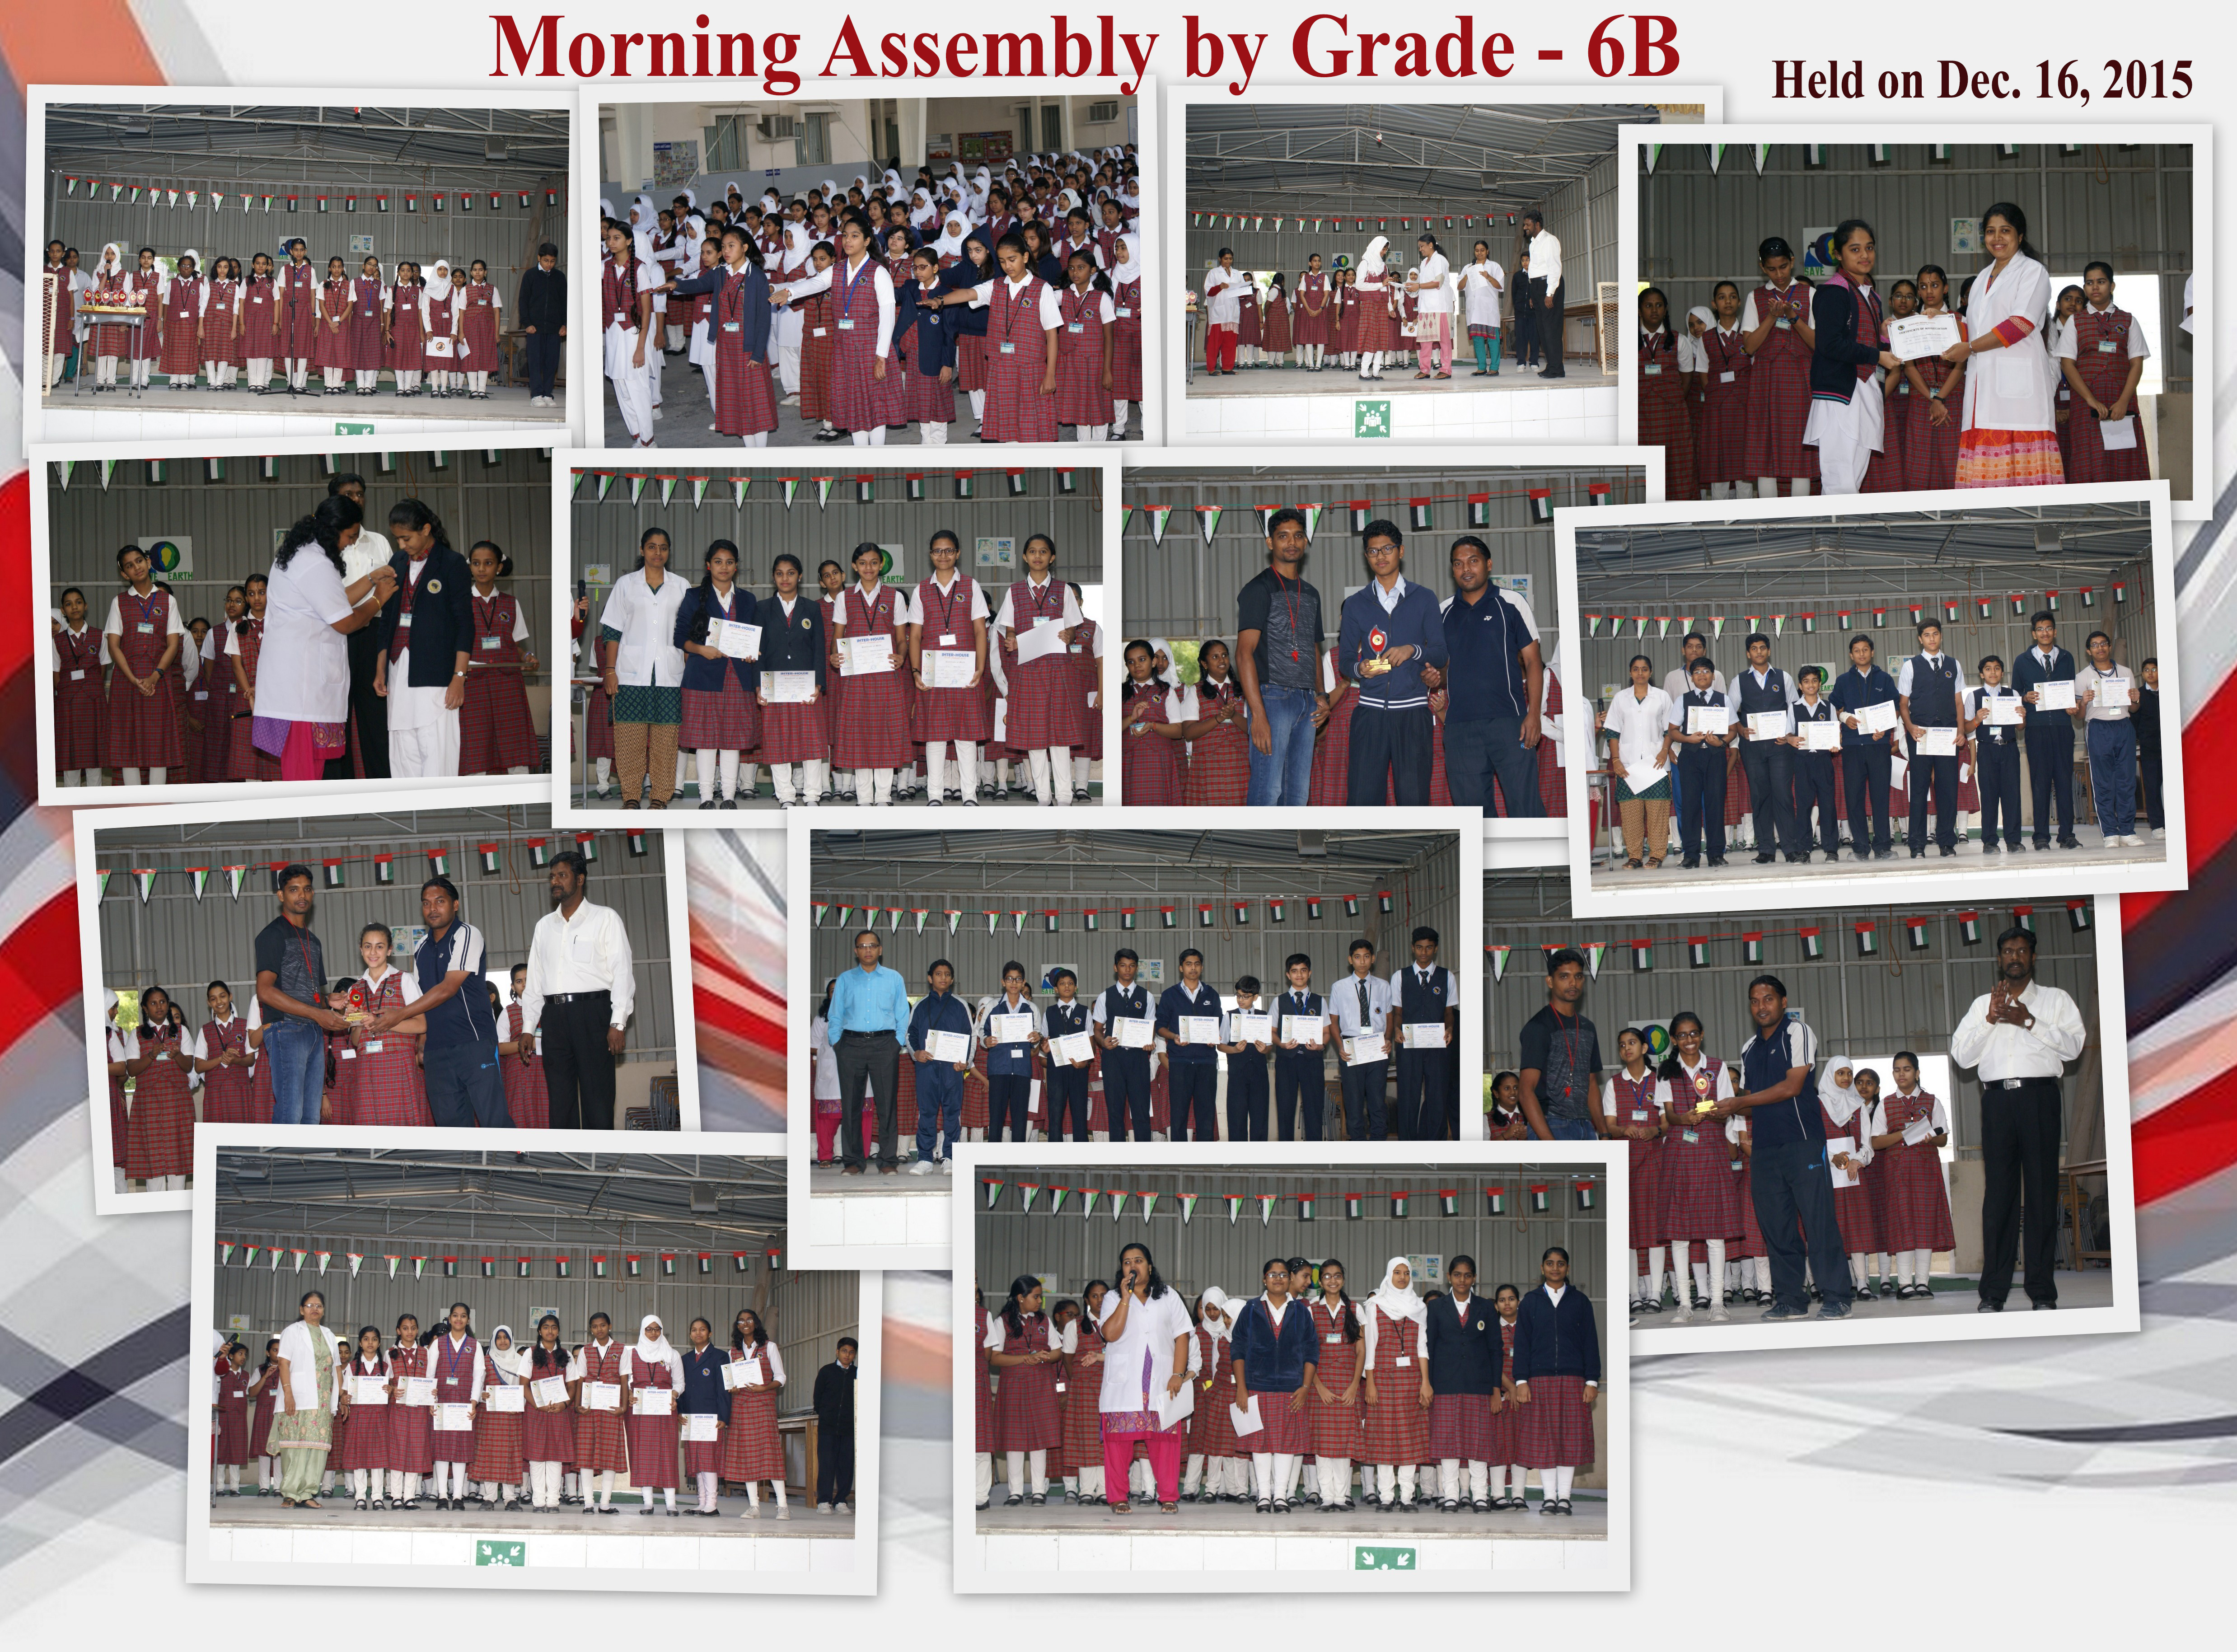 Assembly Dec 16